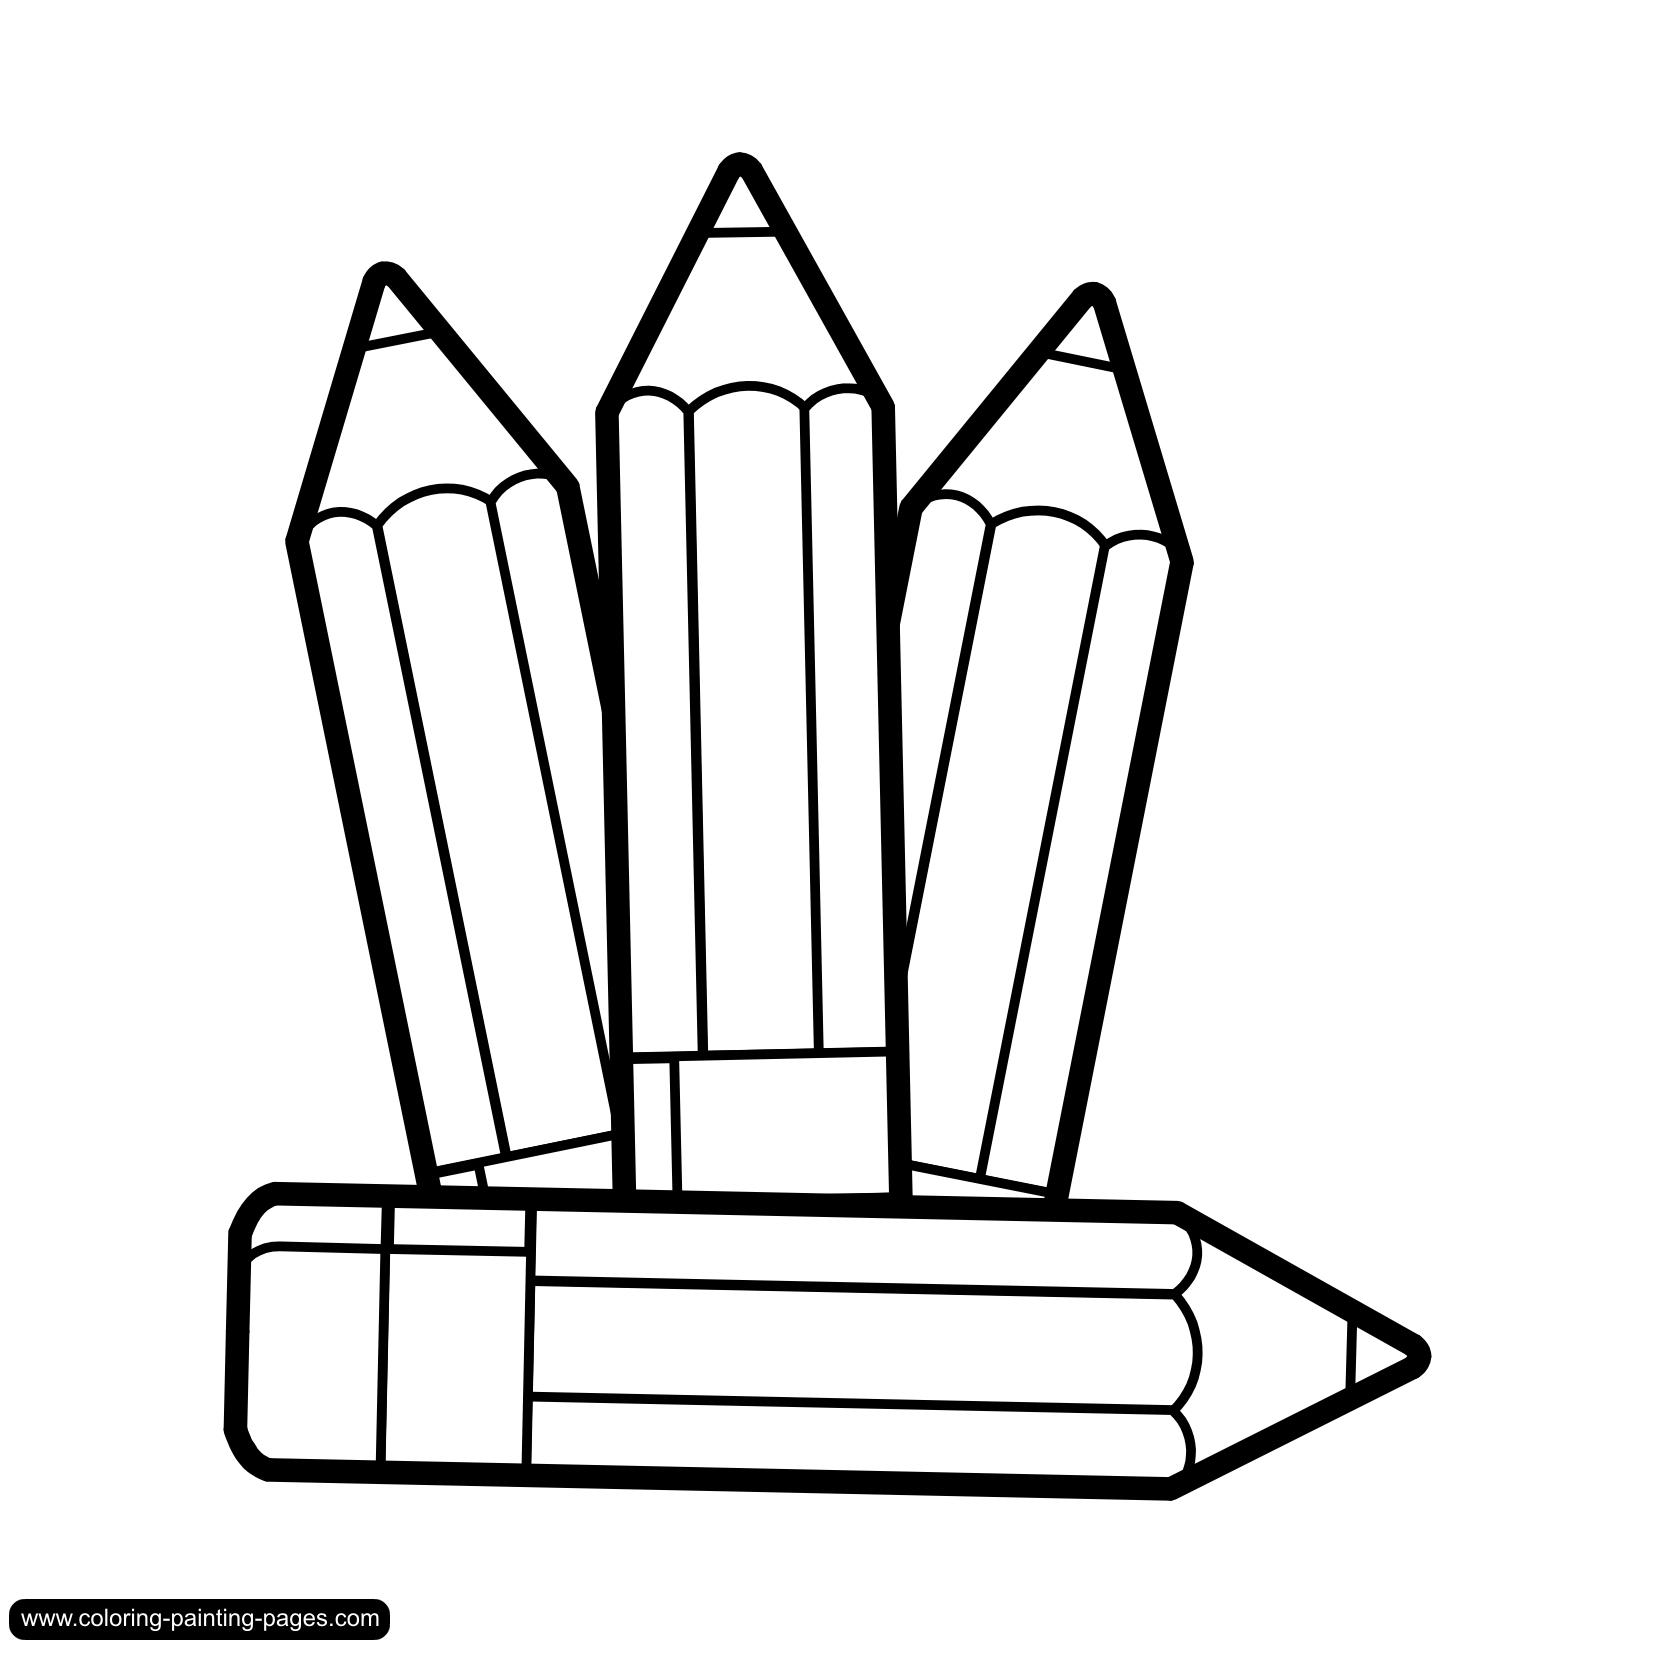 Pencil  black and white marker clipart black and white pencil in color marker